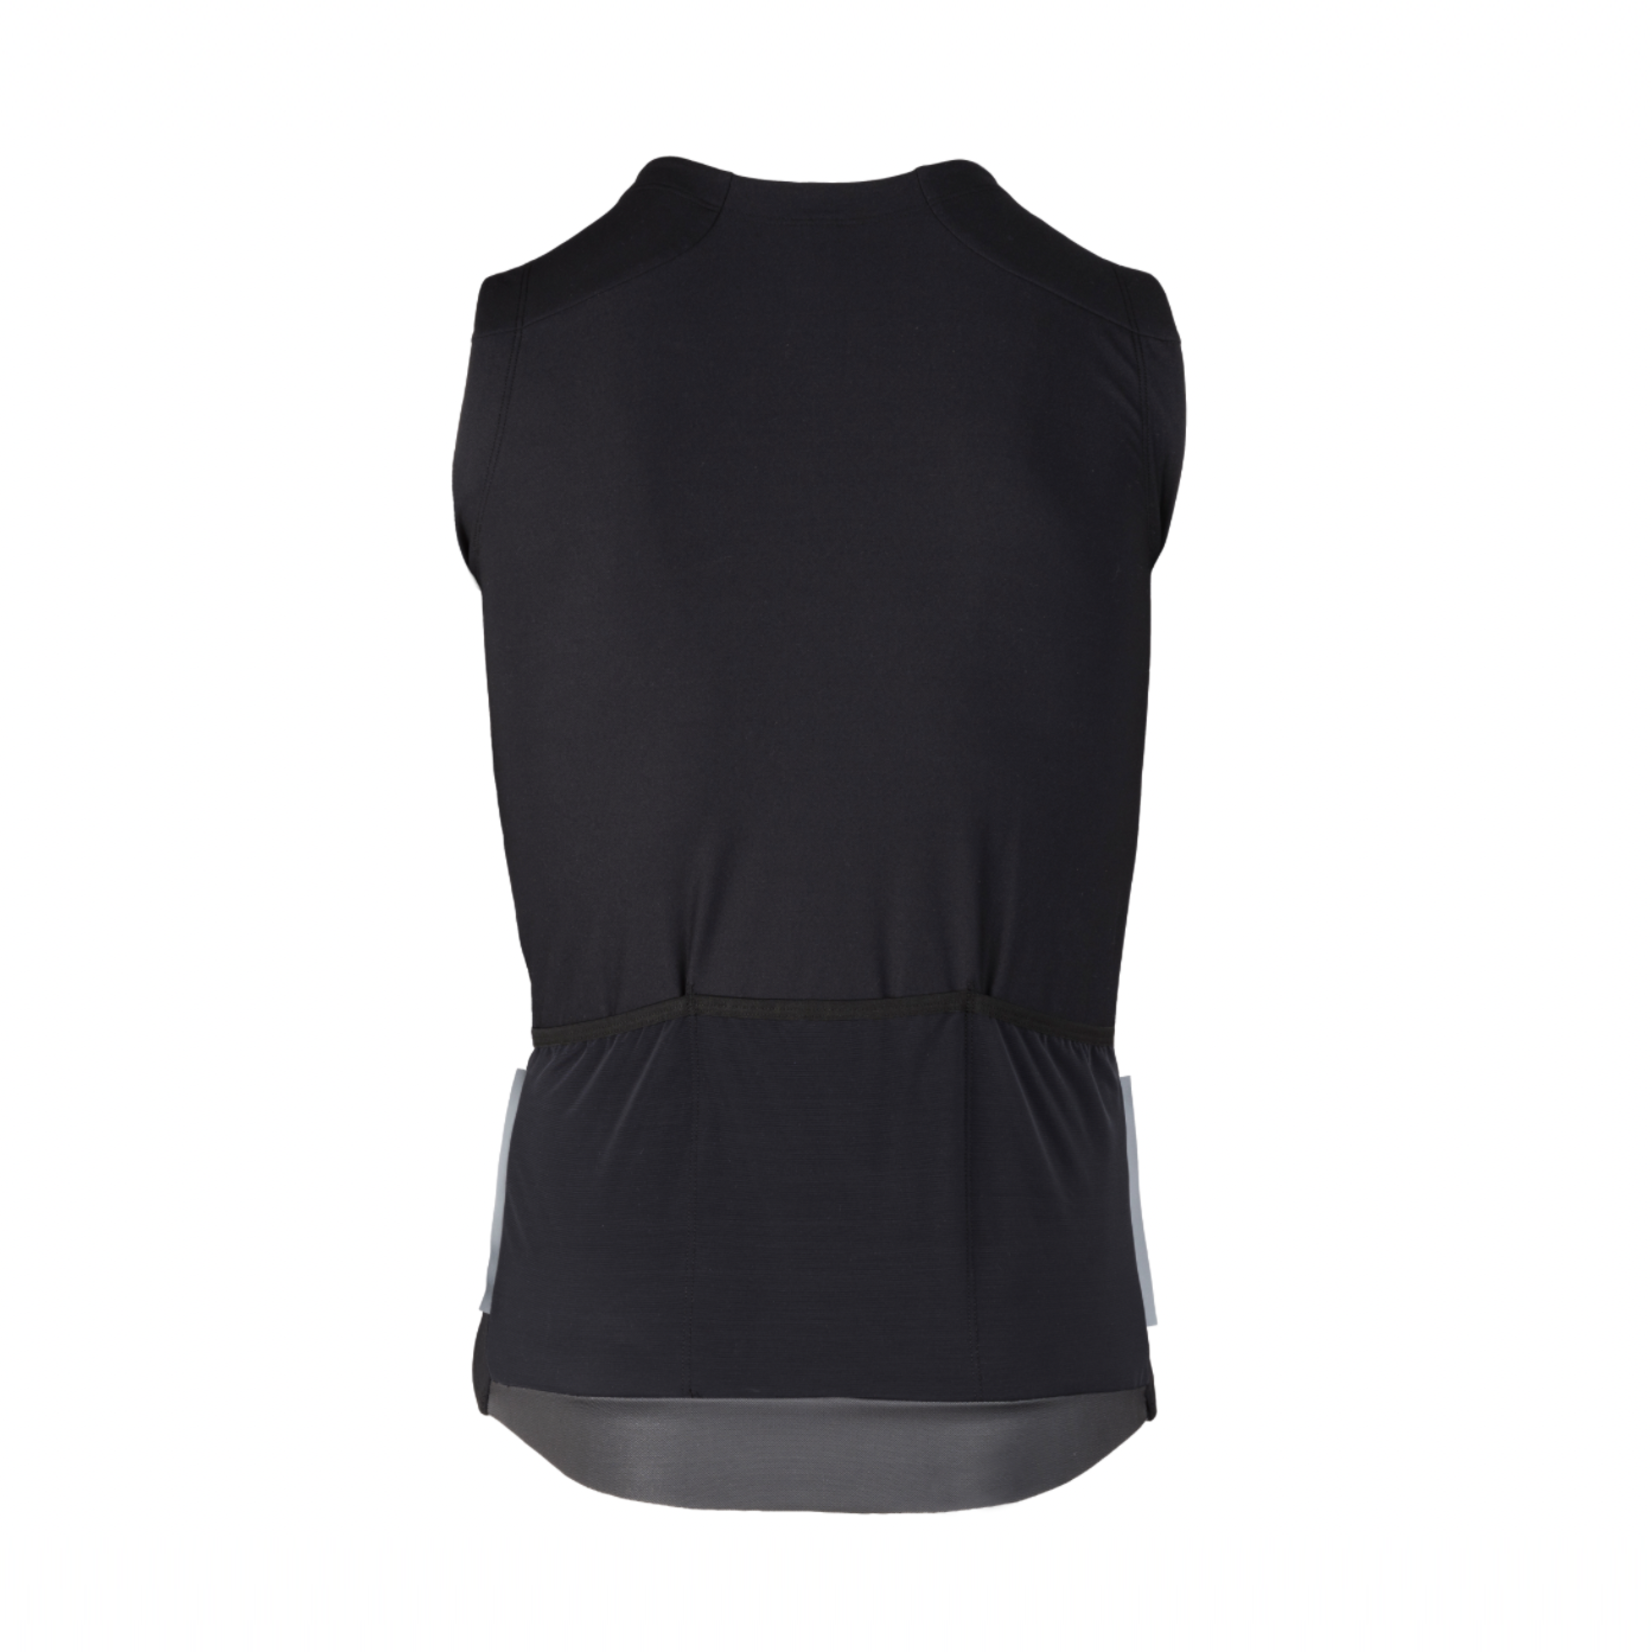 Q36.5 Q36.5 Vest Insulated Woolf Bombardino - Black